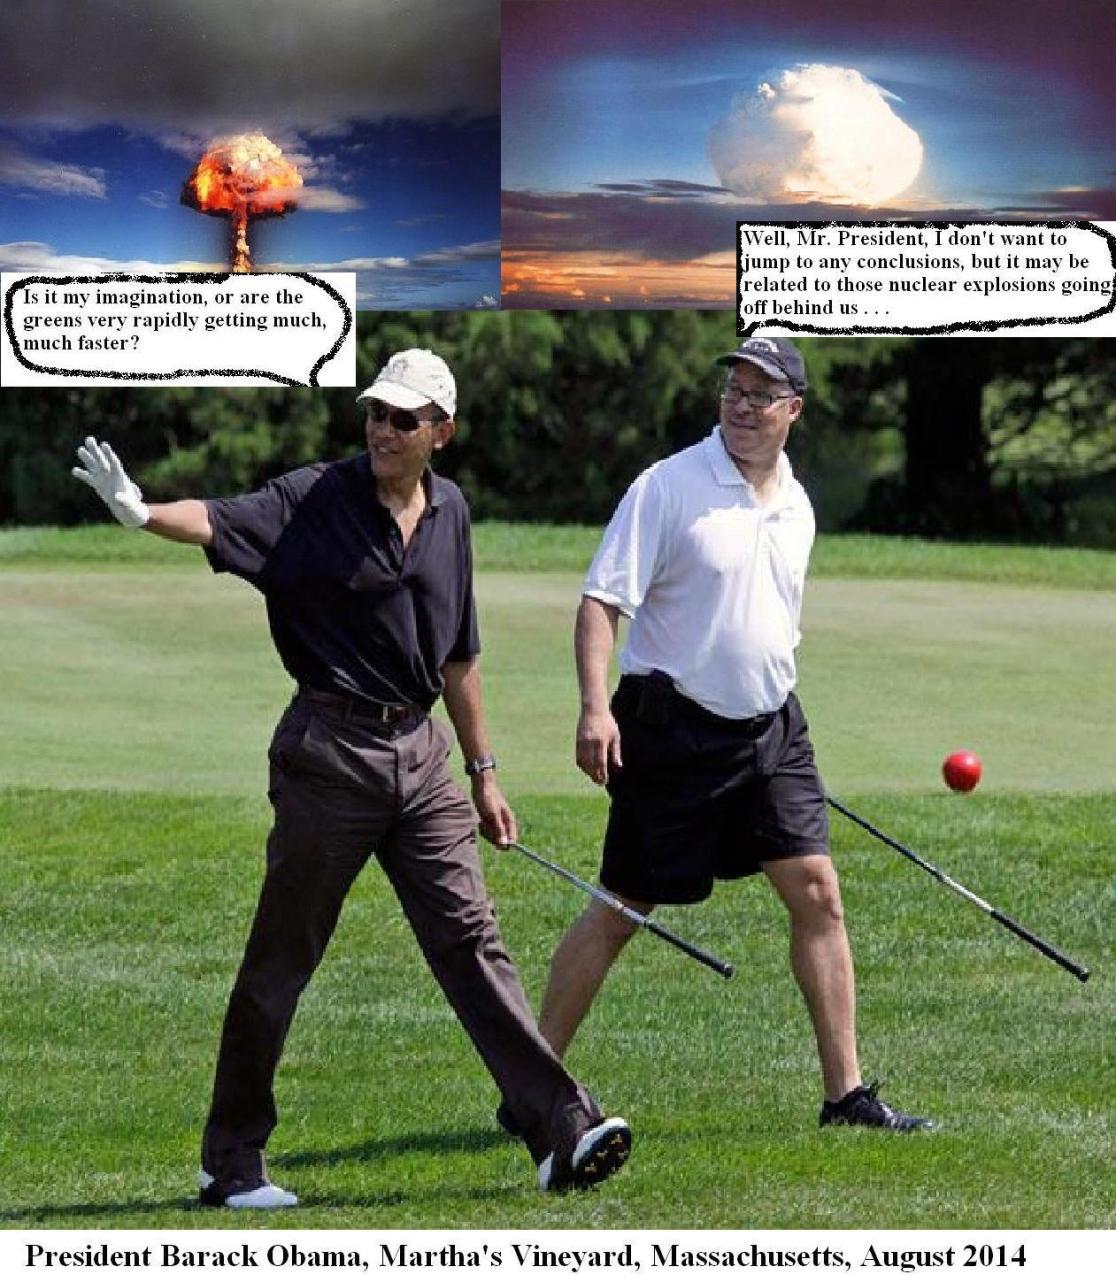 Obama_w_Other_Golfer__Marthas_Vineyard_Aug_2014__CAP